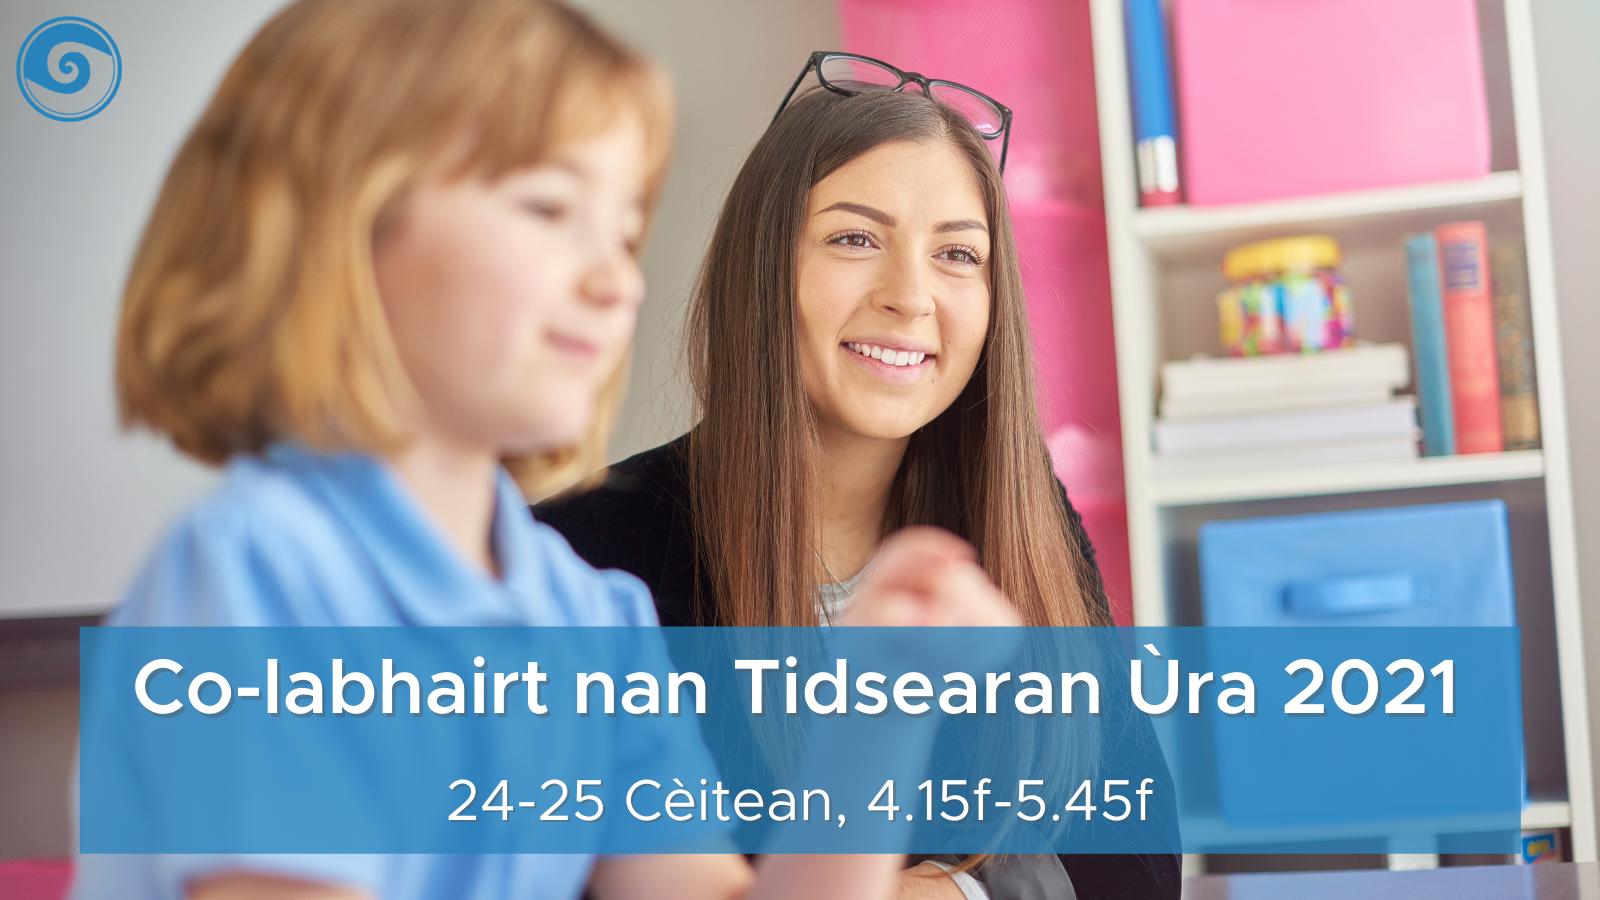 Co-labhairt nan Tidsearan Ùra